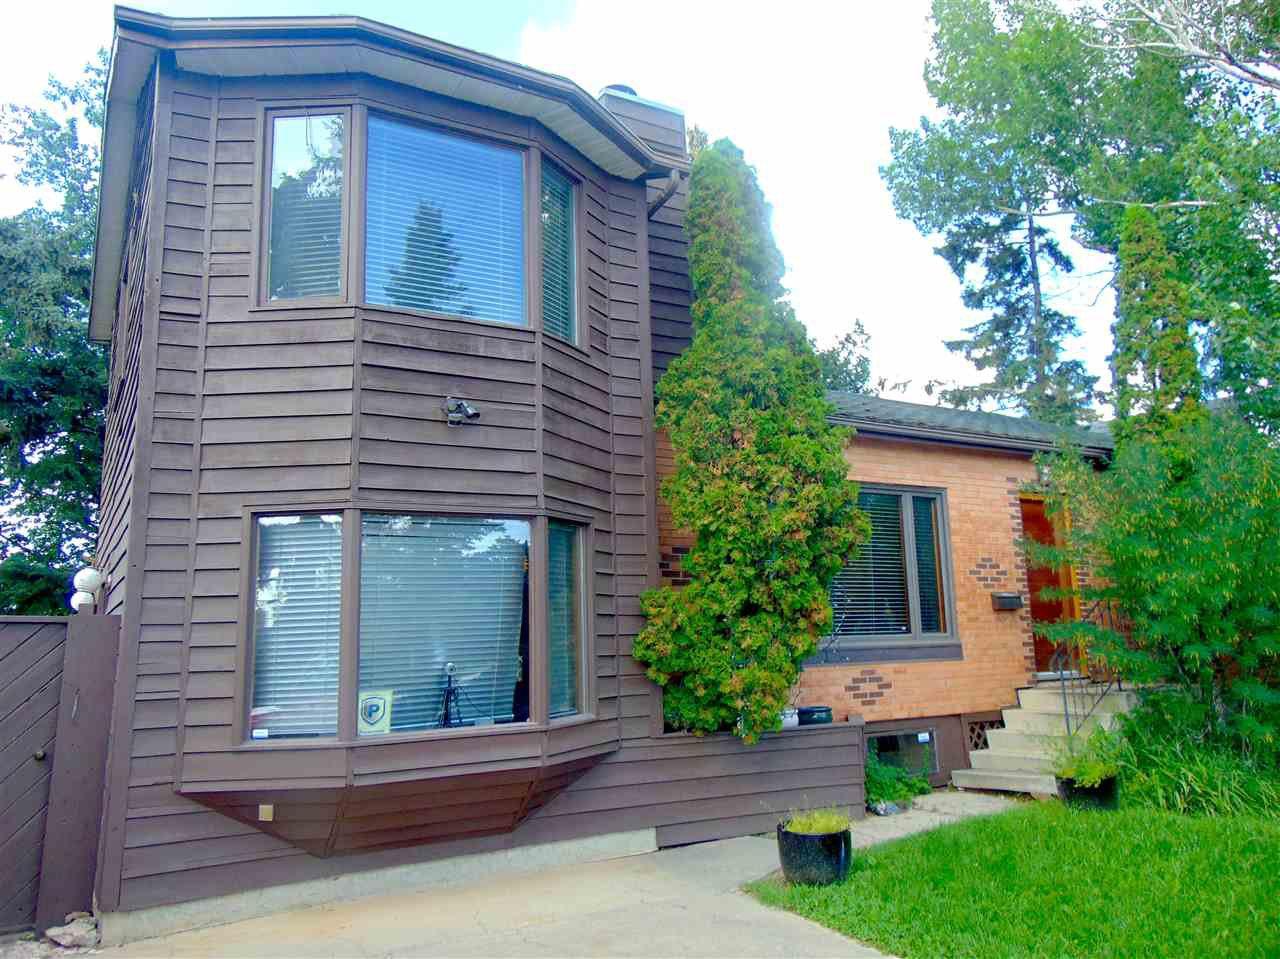 Main Photo: 11026 110 Avenue in Edmonton: Zone 08 House for sale : MLS®# E4168139